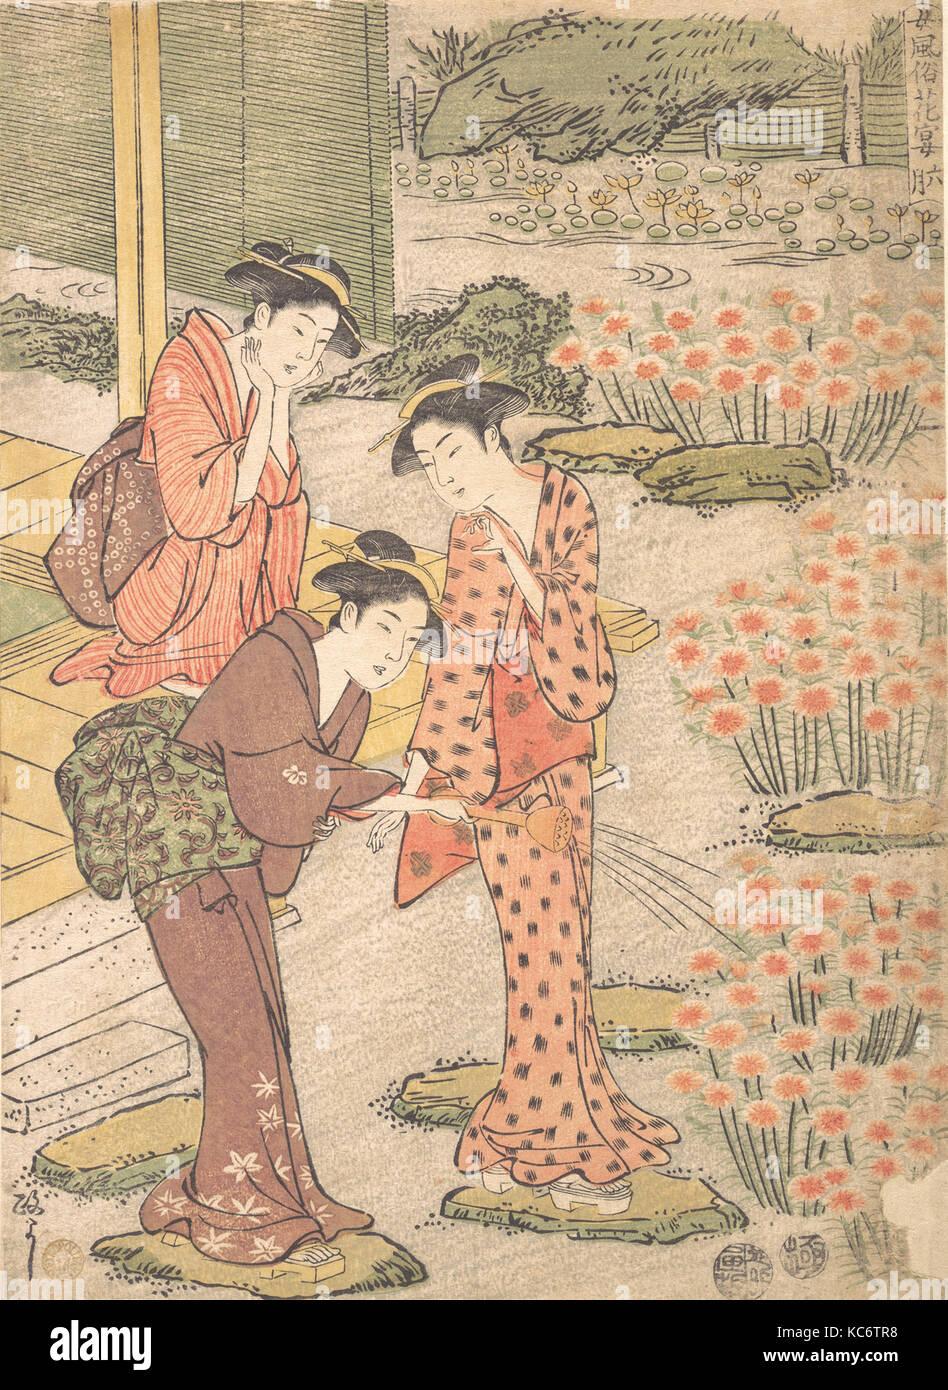 Three Young Women in a Garden where Nadeshiko Pinks are Growing, Kuwagata Keisai, ca. 1790 - Stock Image